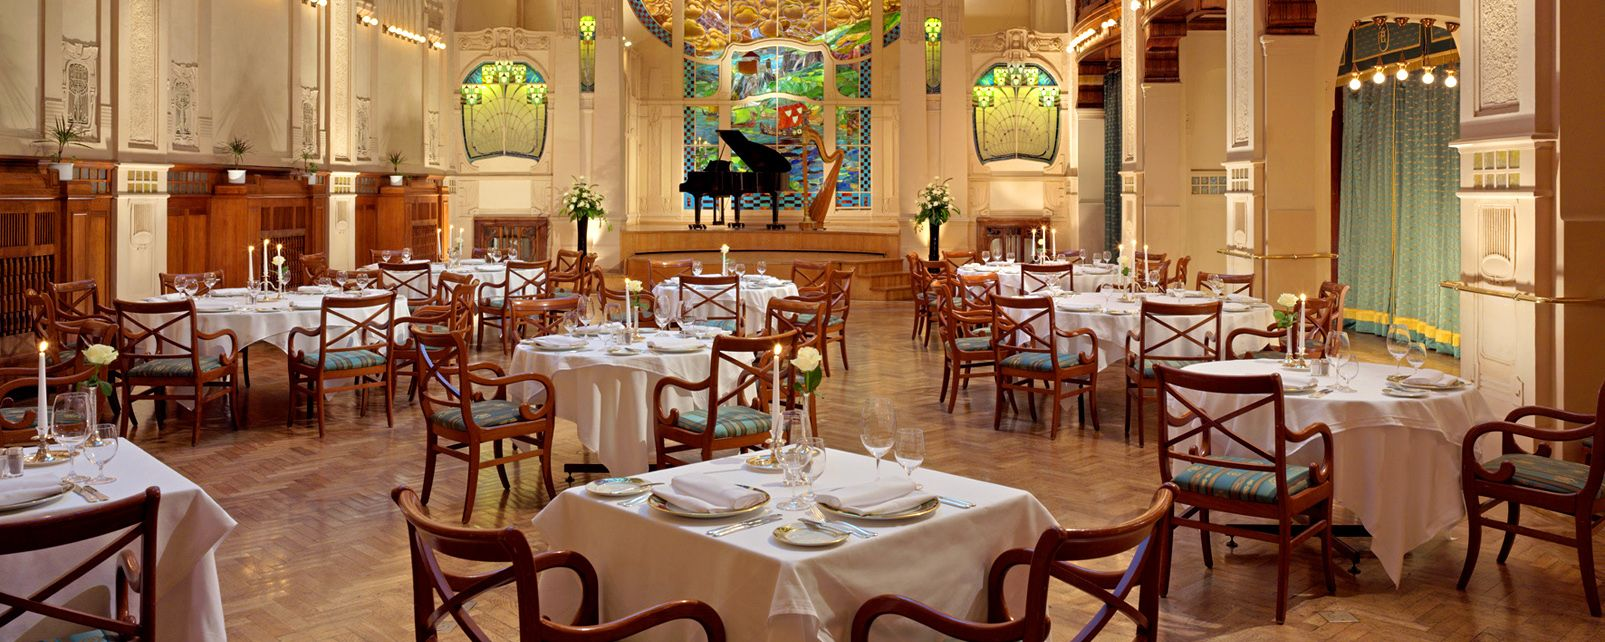 Hôtel Belmond Grand Hotel Europe